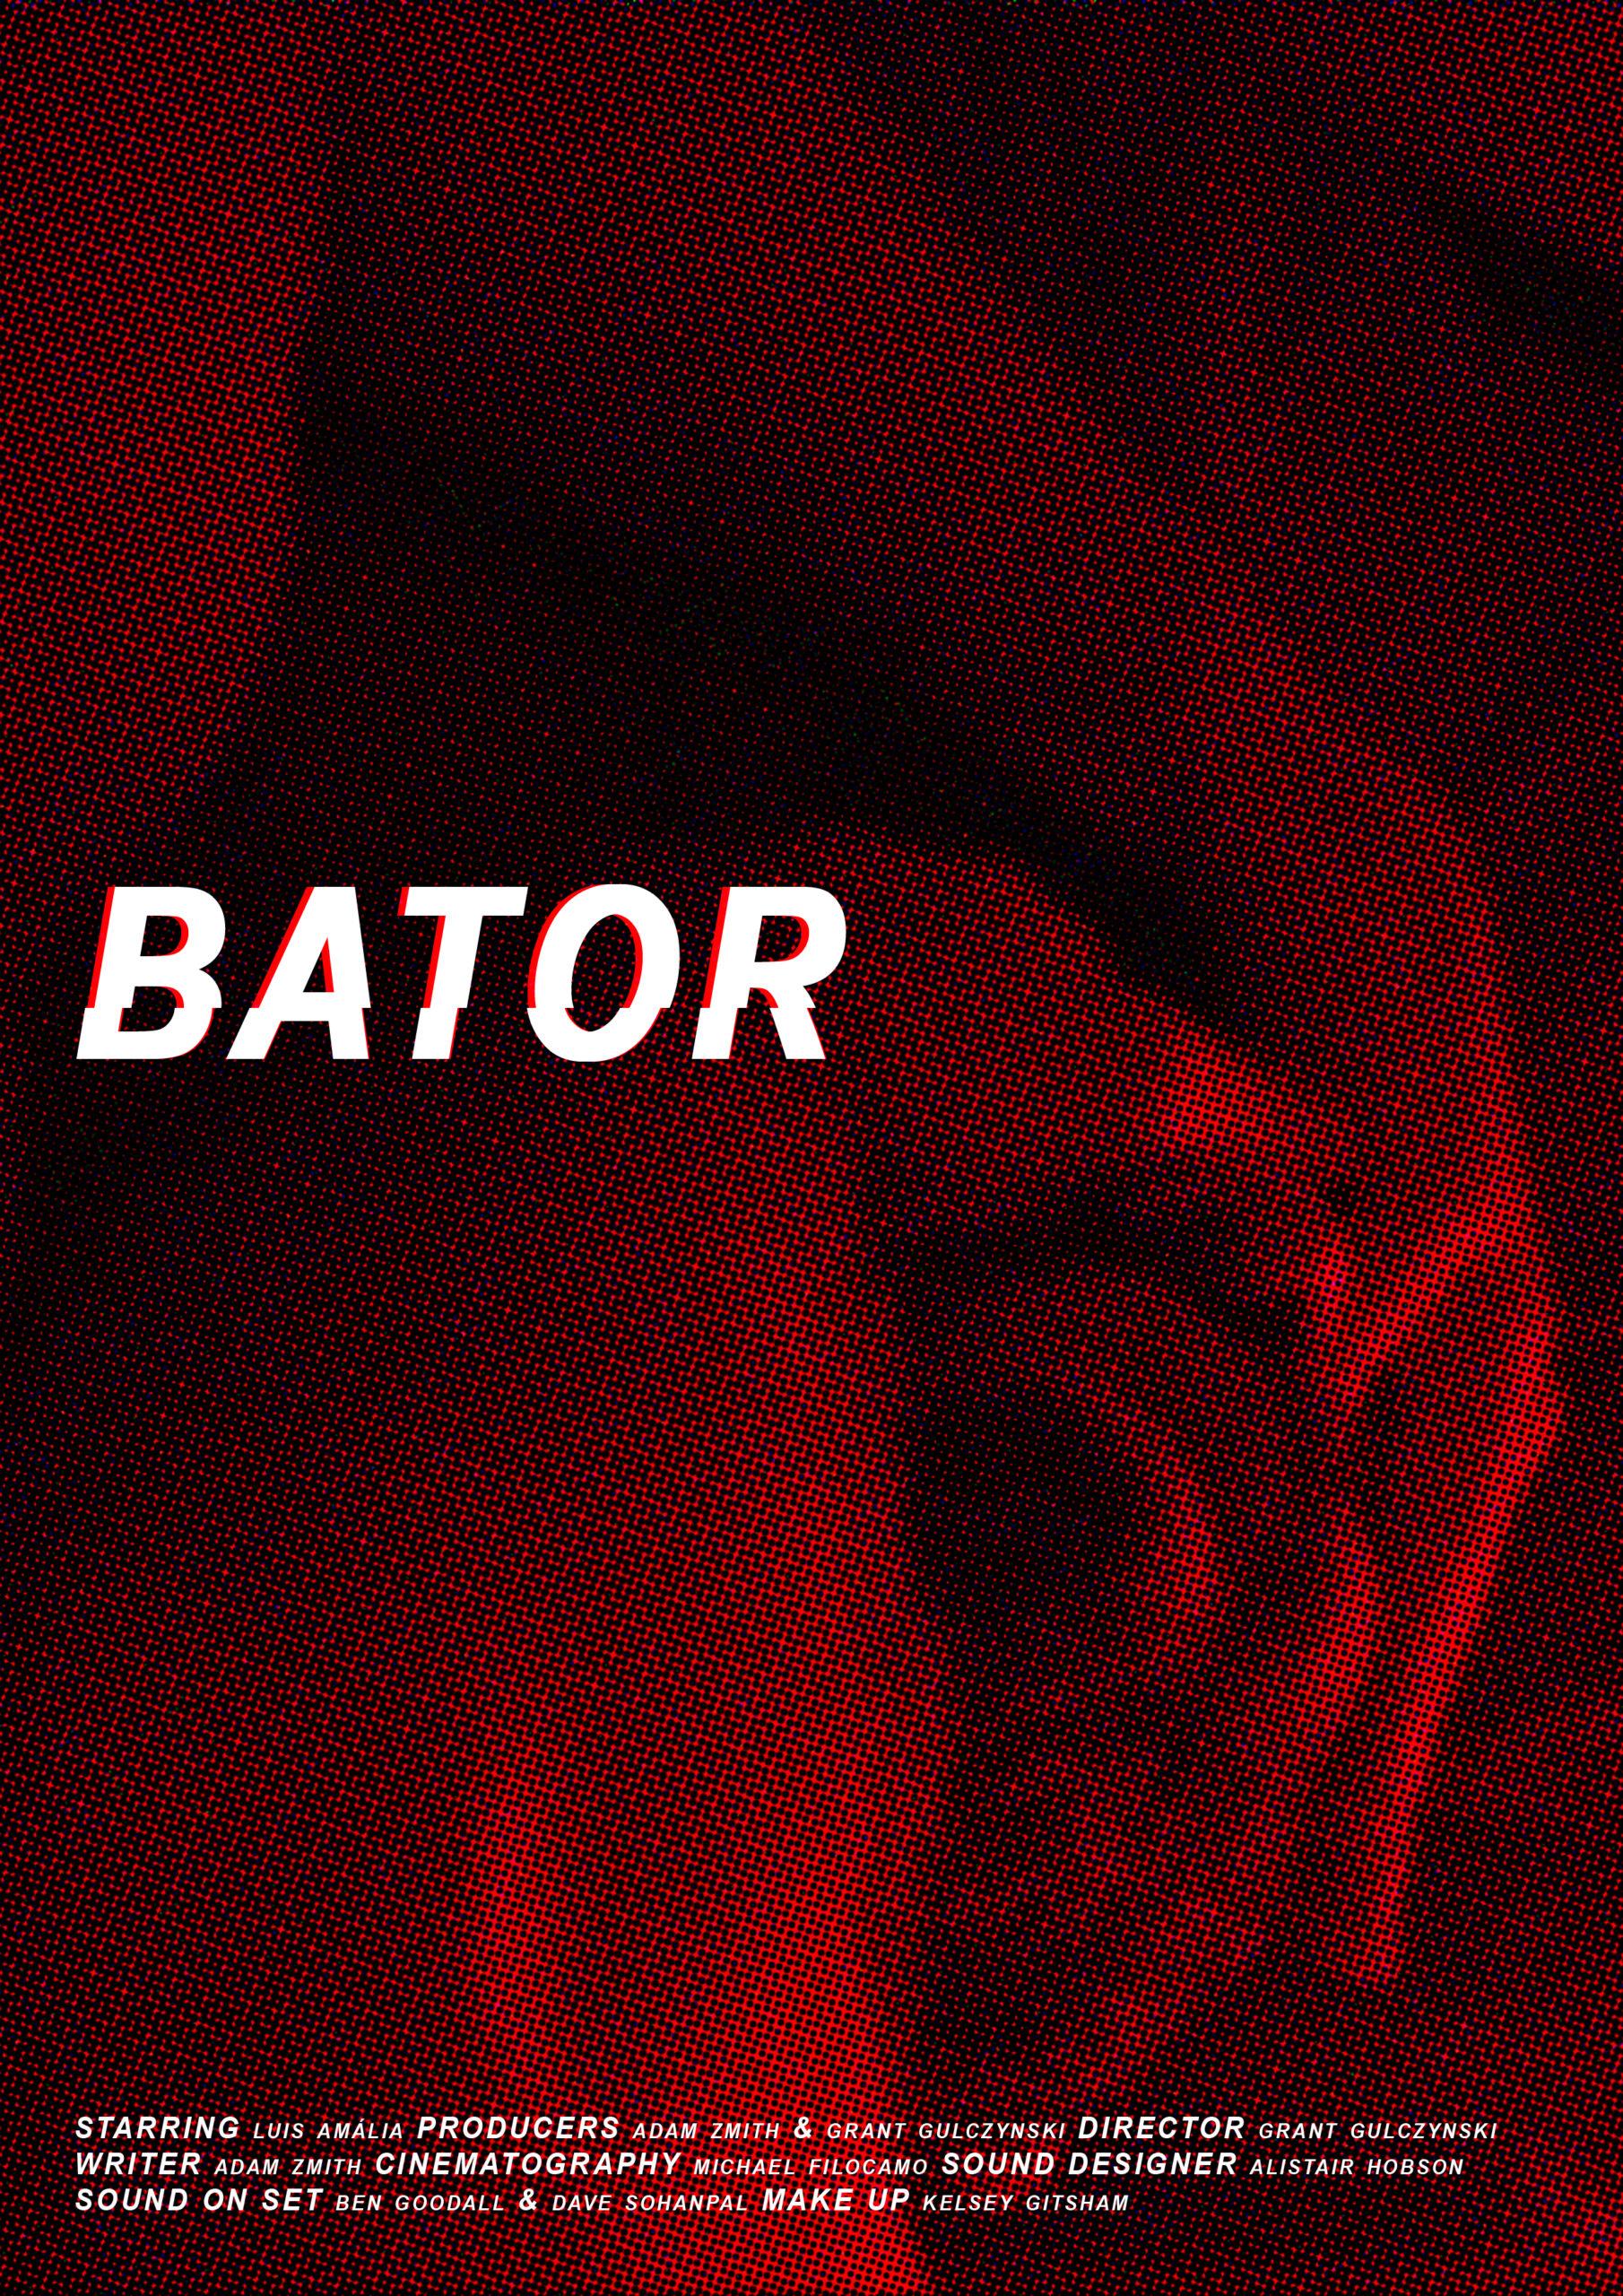 BATOR-DEFINITIVO-02